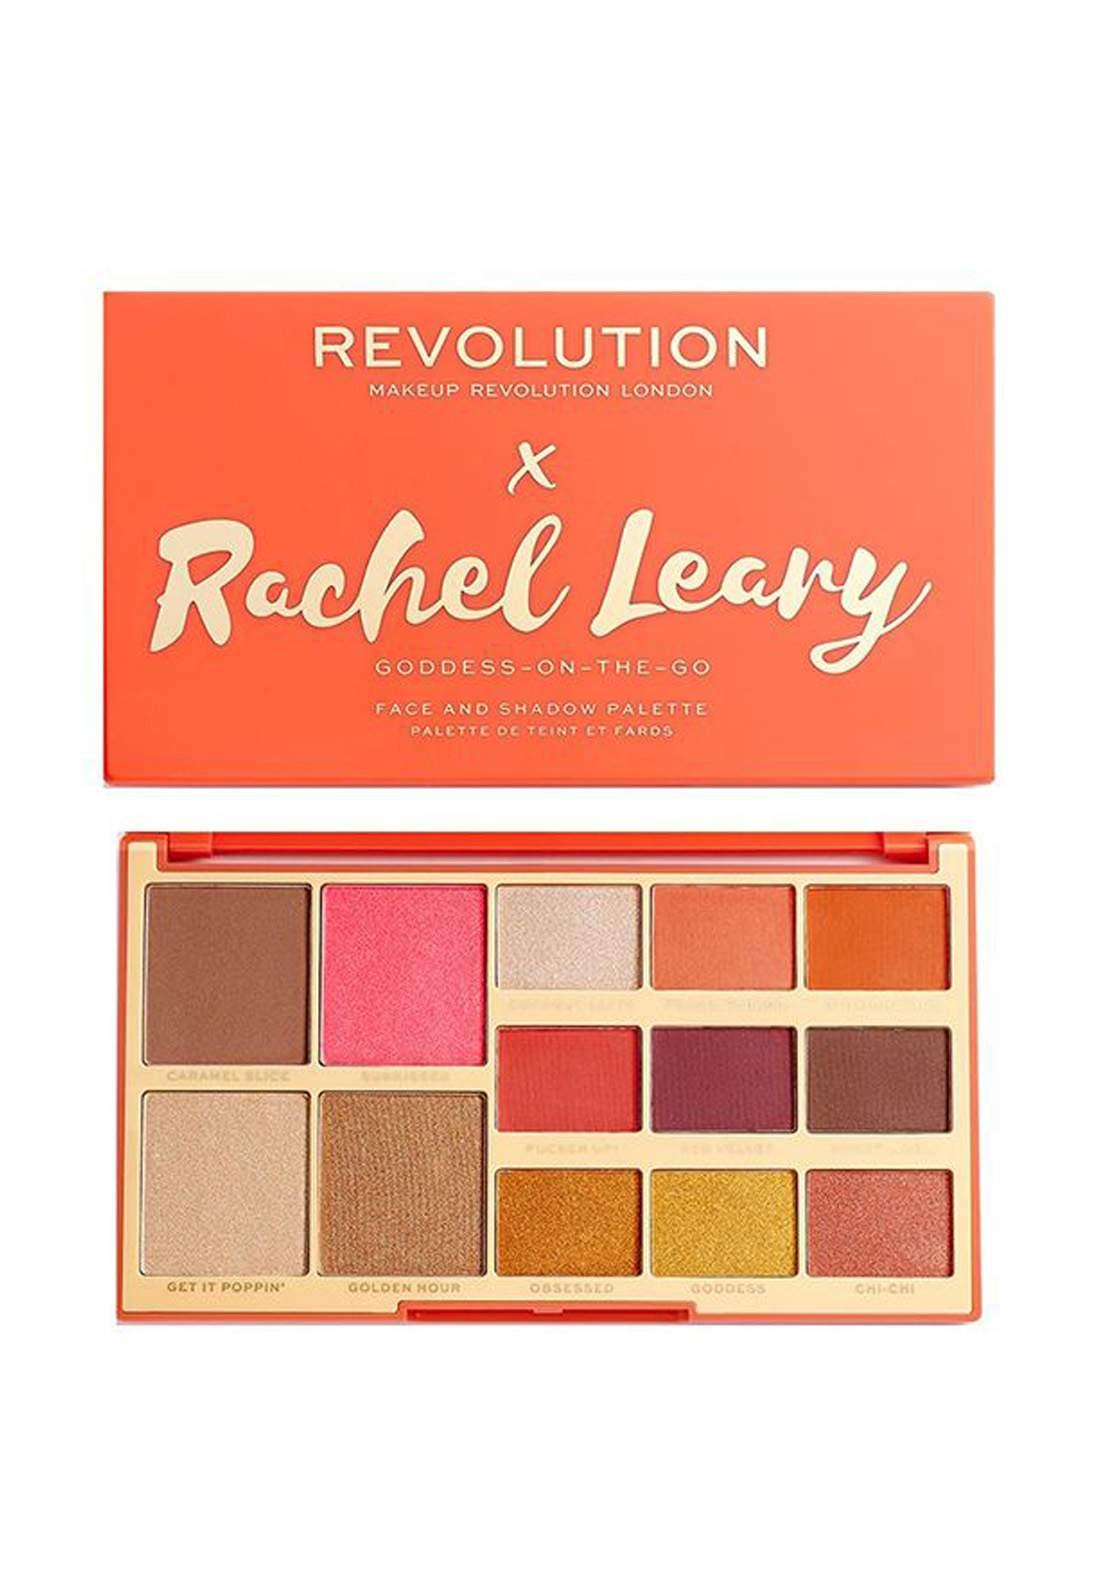 Revolution X Rachel Leary Goddess On The Go Eyeshadow Palette 1.2 G باليت